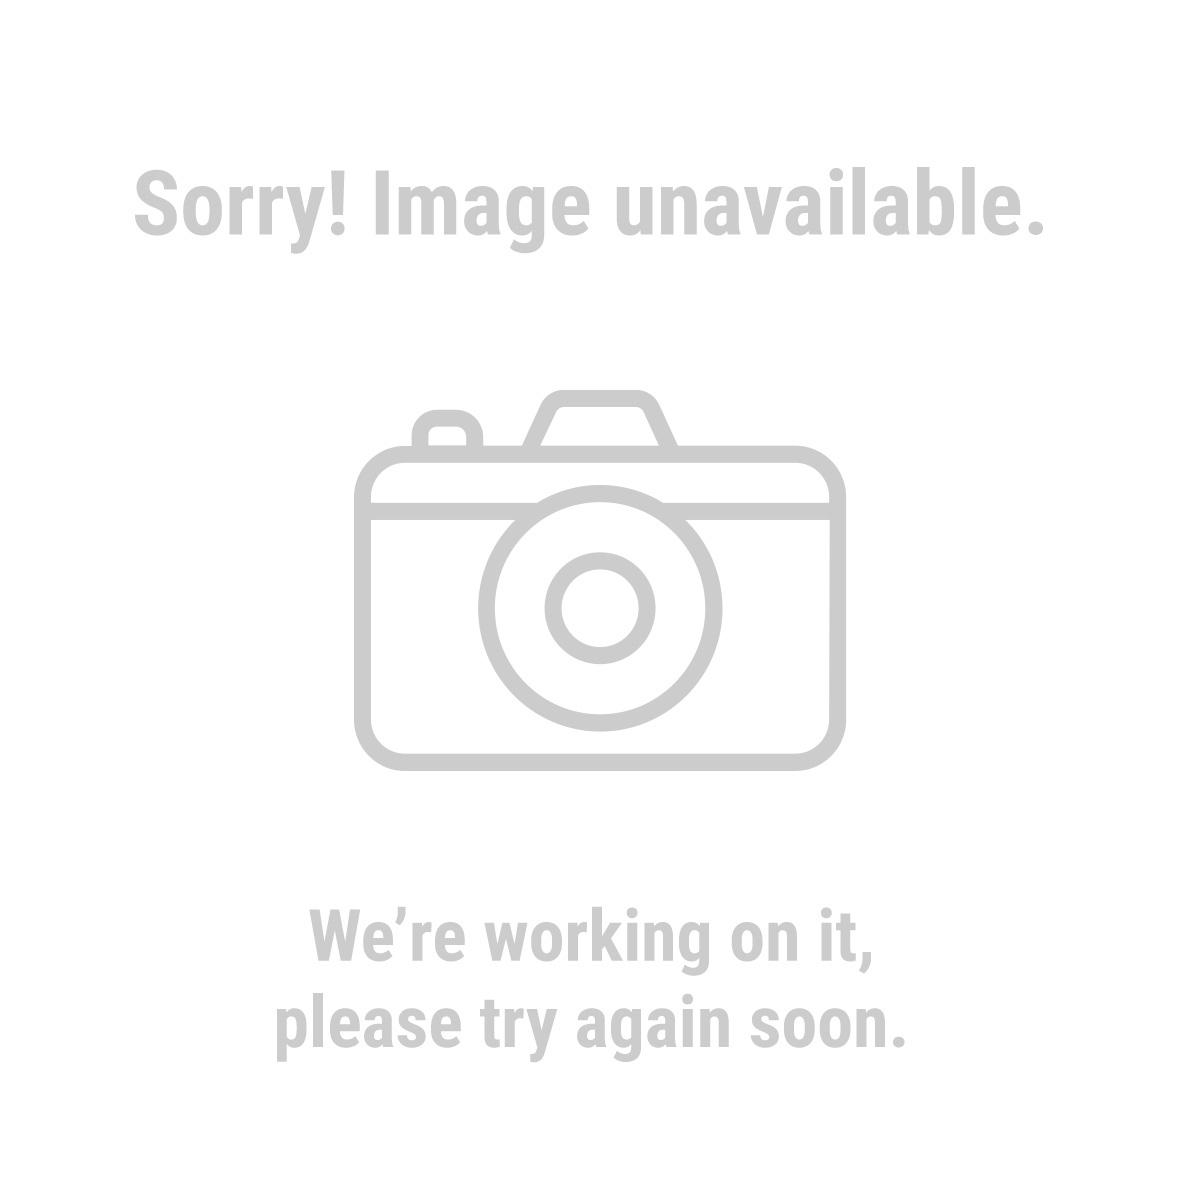 Haul-Master 96406 2-1/4 Ton Trailer Stabilizer Jack